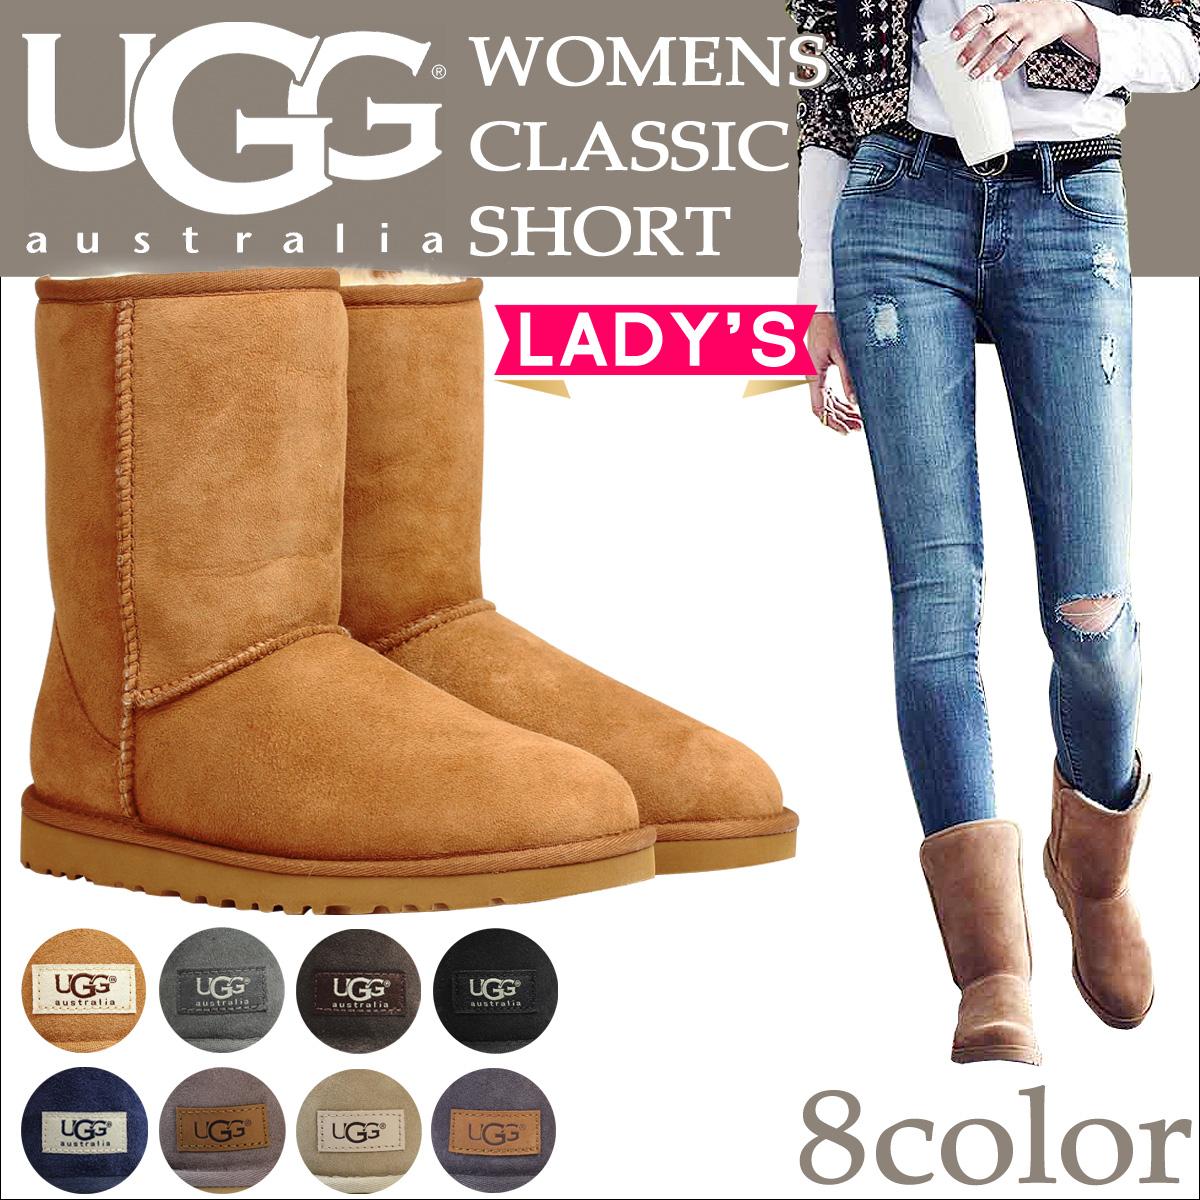 UGG UGG women's classic short Sheepskin boots 5825 WOMENS CLASSIC SHORT ladies FALL 2013 new Sheepskin 43% off!